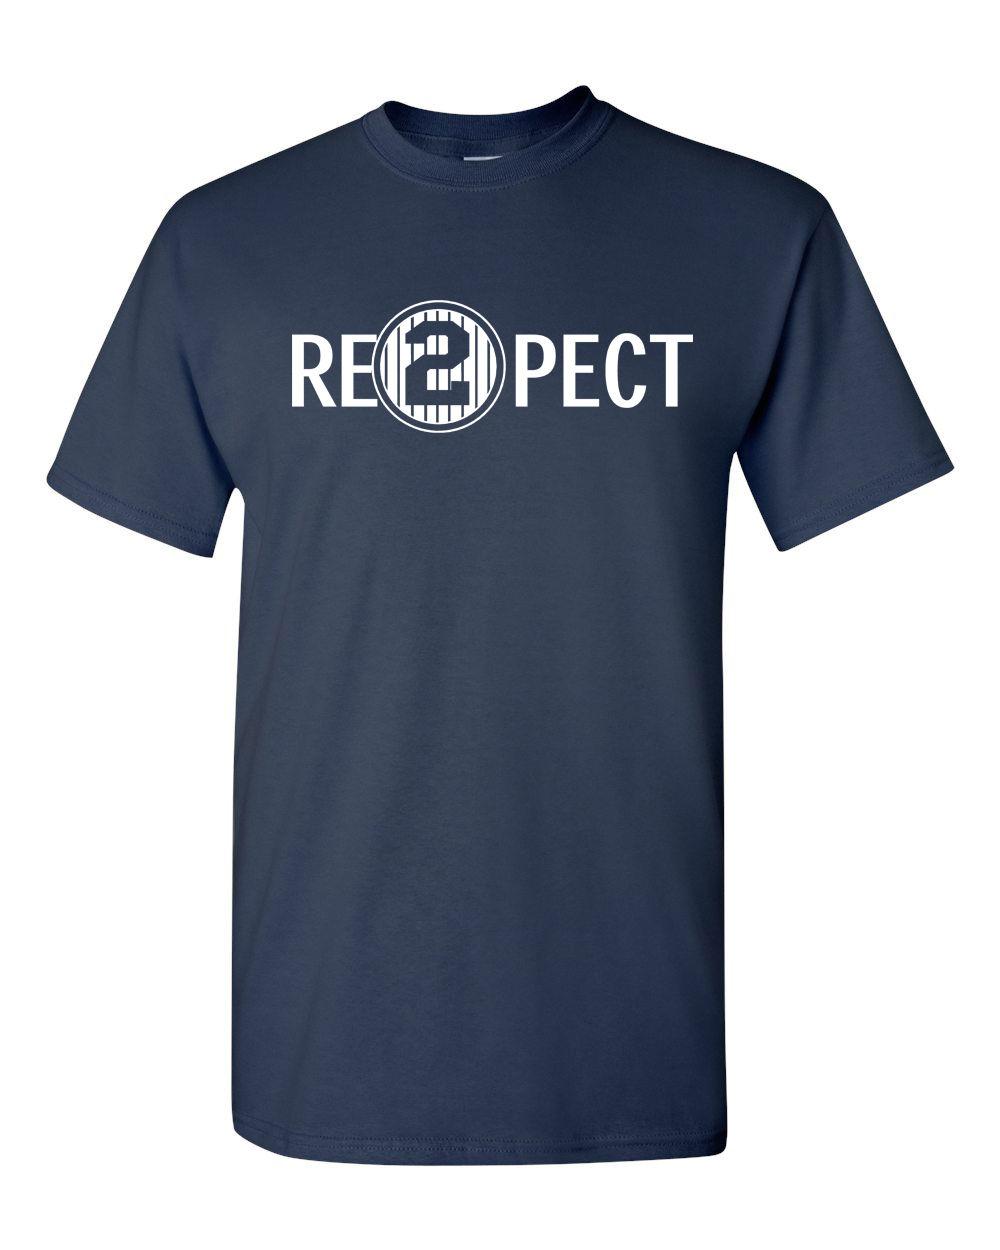 Quality Print New Summer Style Cotton Respect 2 Re2Pect Derek Jeter Captain Ny Yankees MenS Tee Shirt 1173 ...